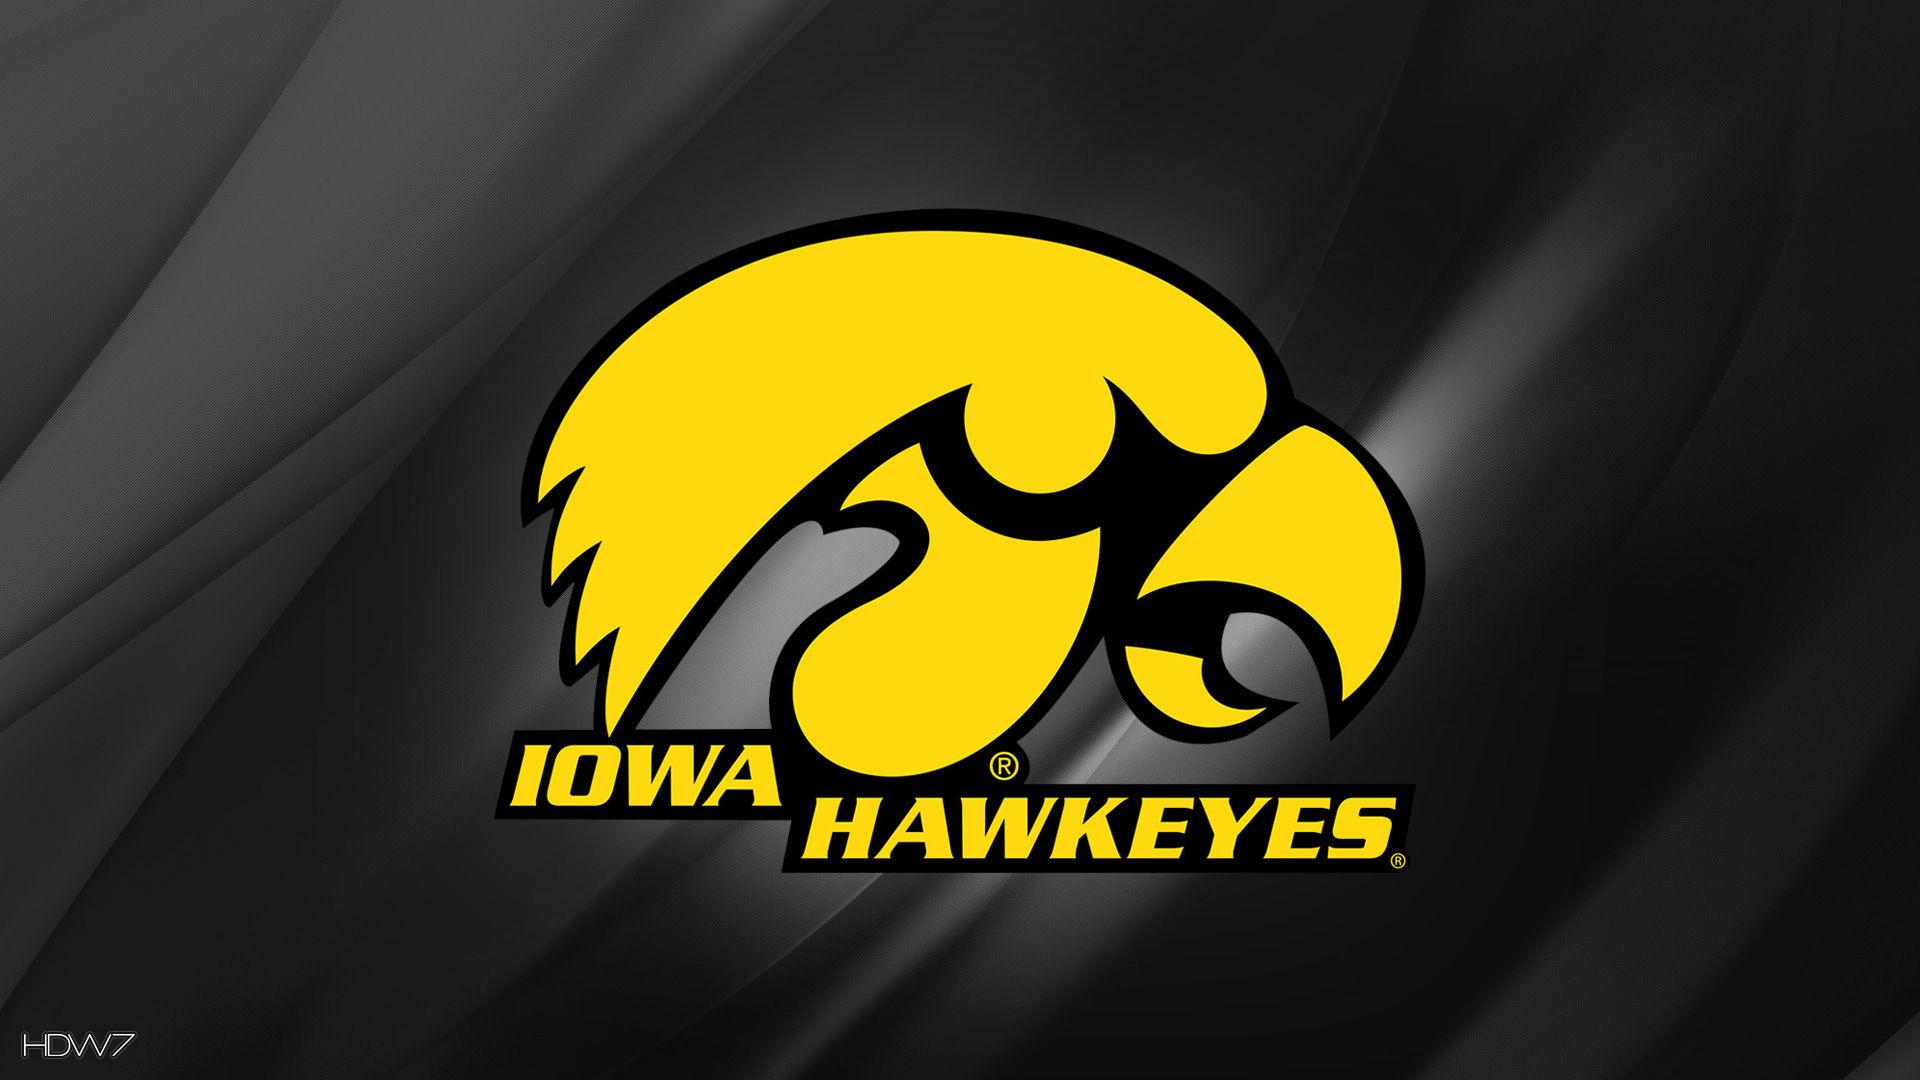 Iowa Hawkeye Screensavers and Wallpaper